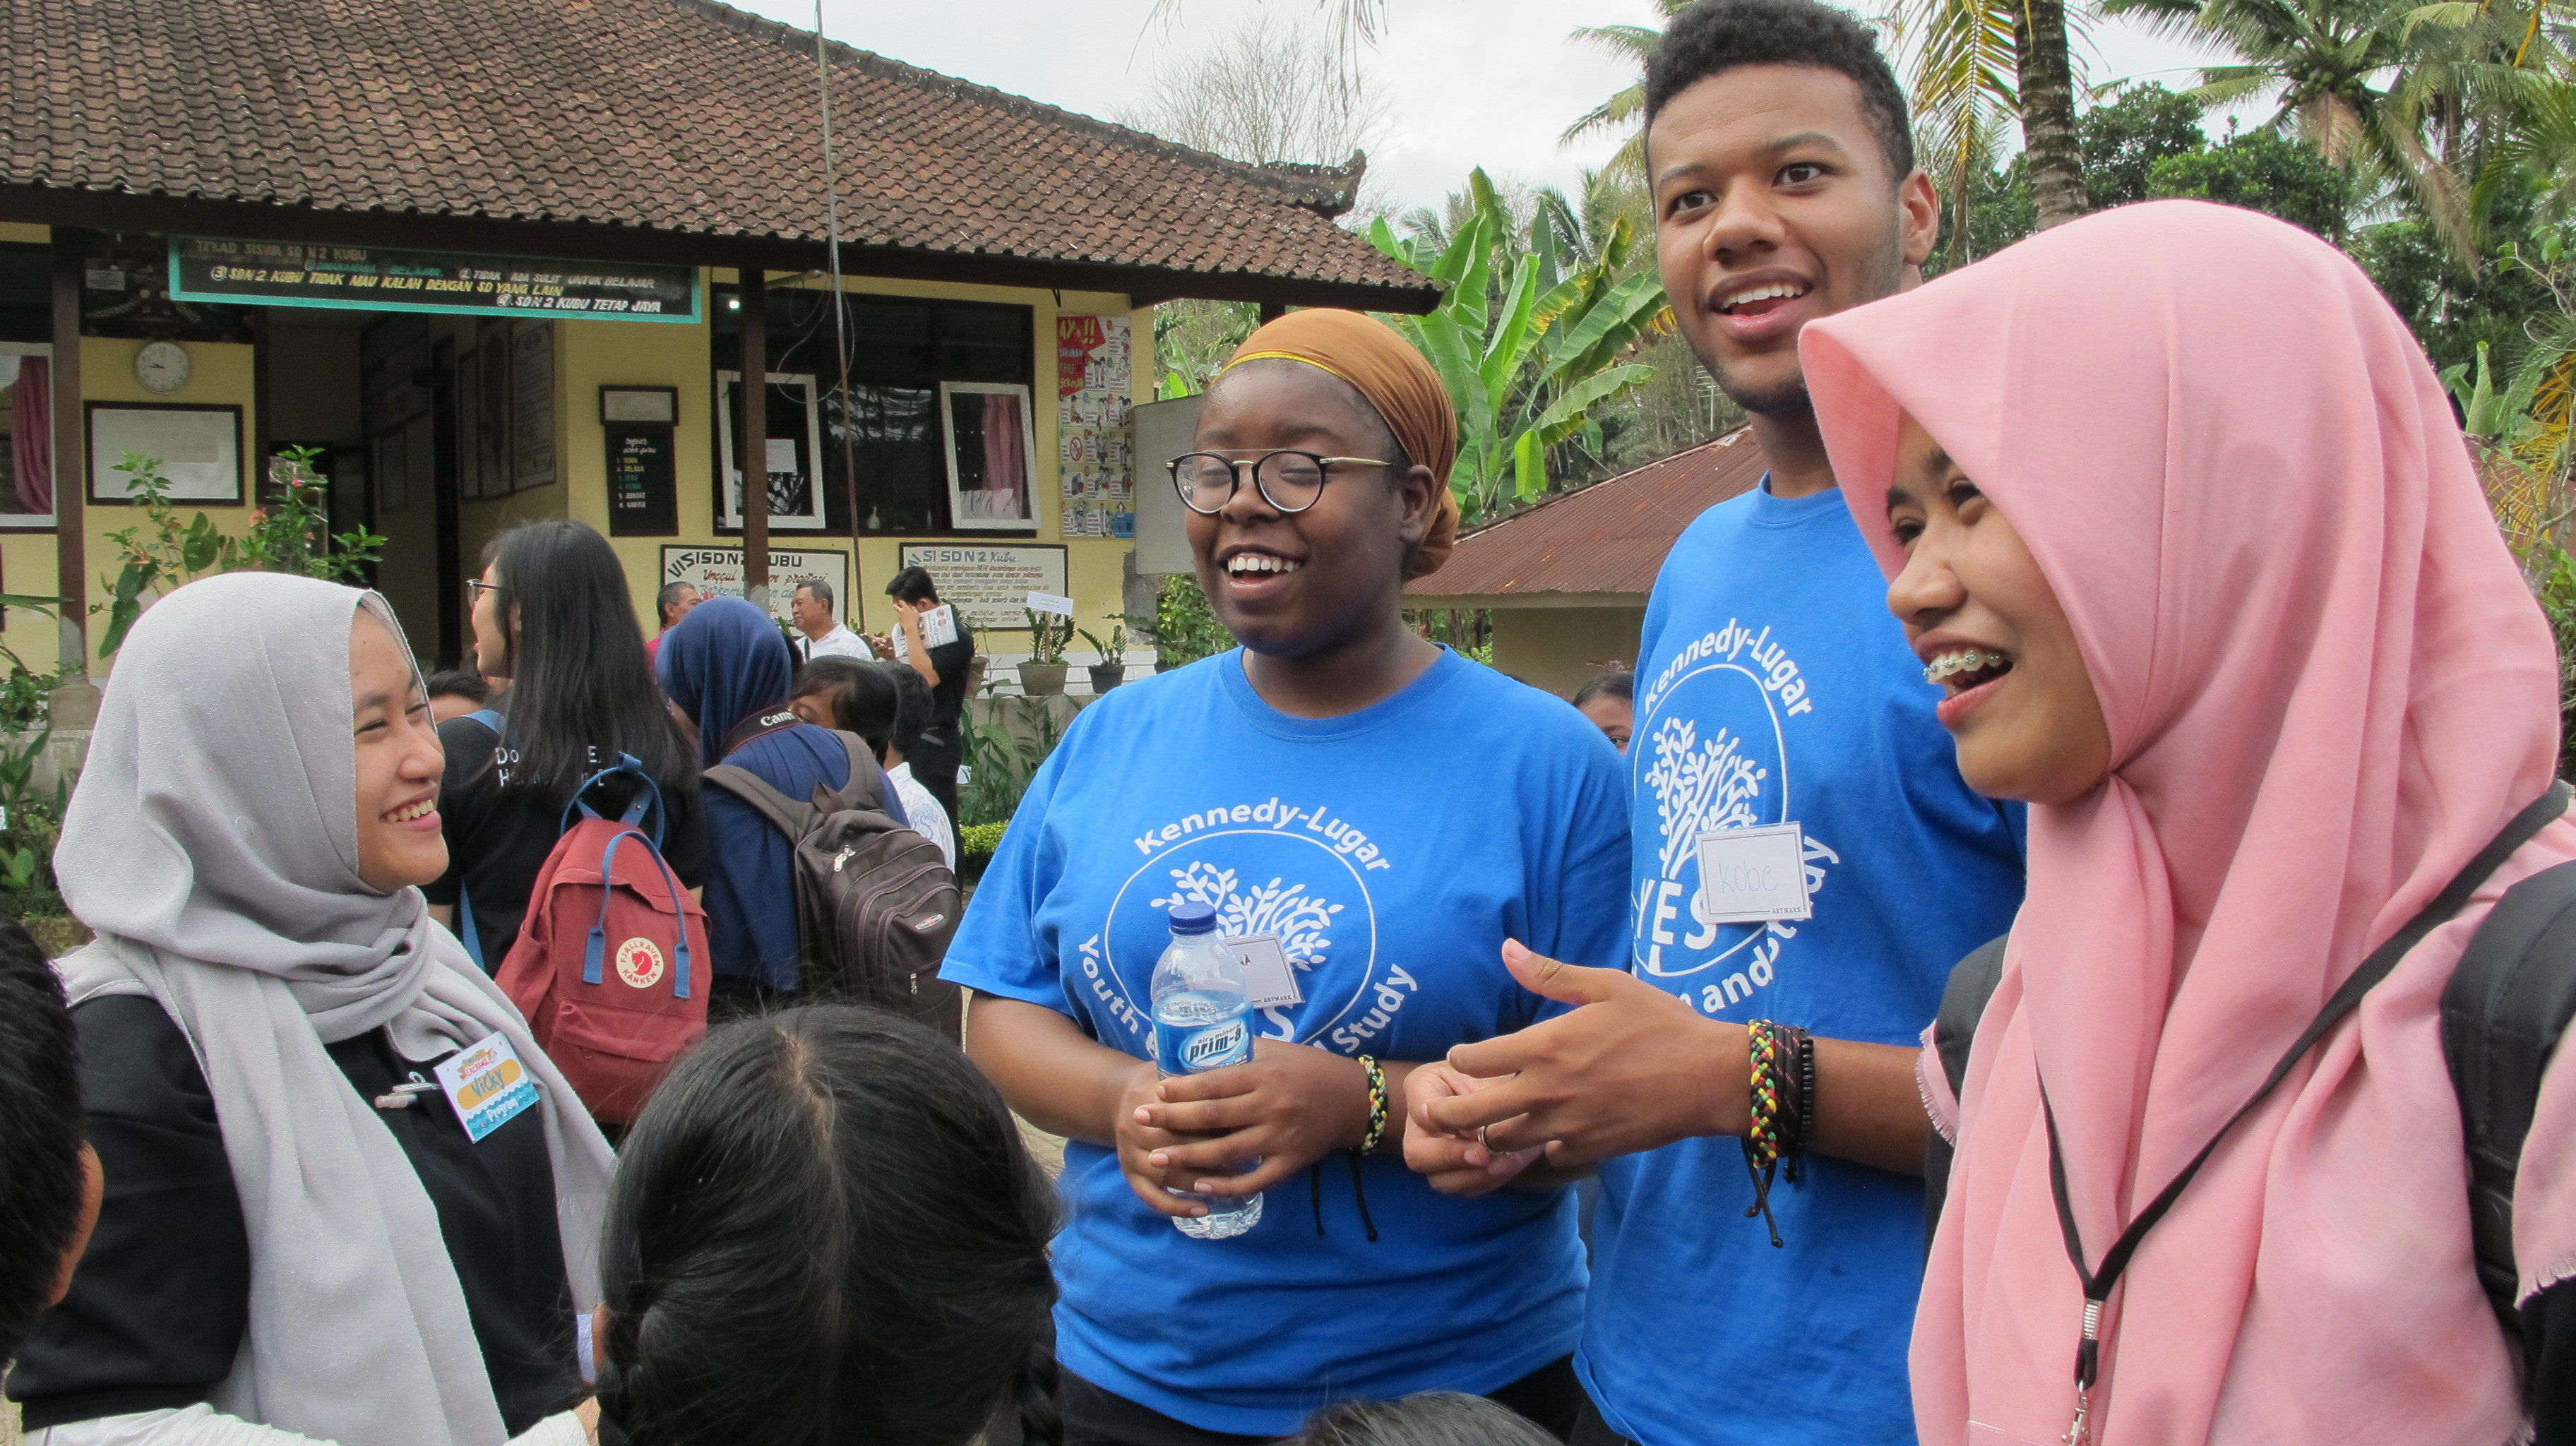 Ina Brantley Keauna And Cherry Jakobe Volunteering At Local Elementary School